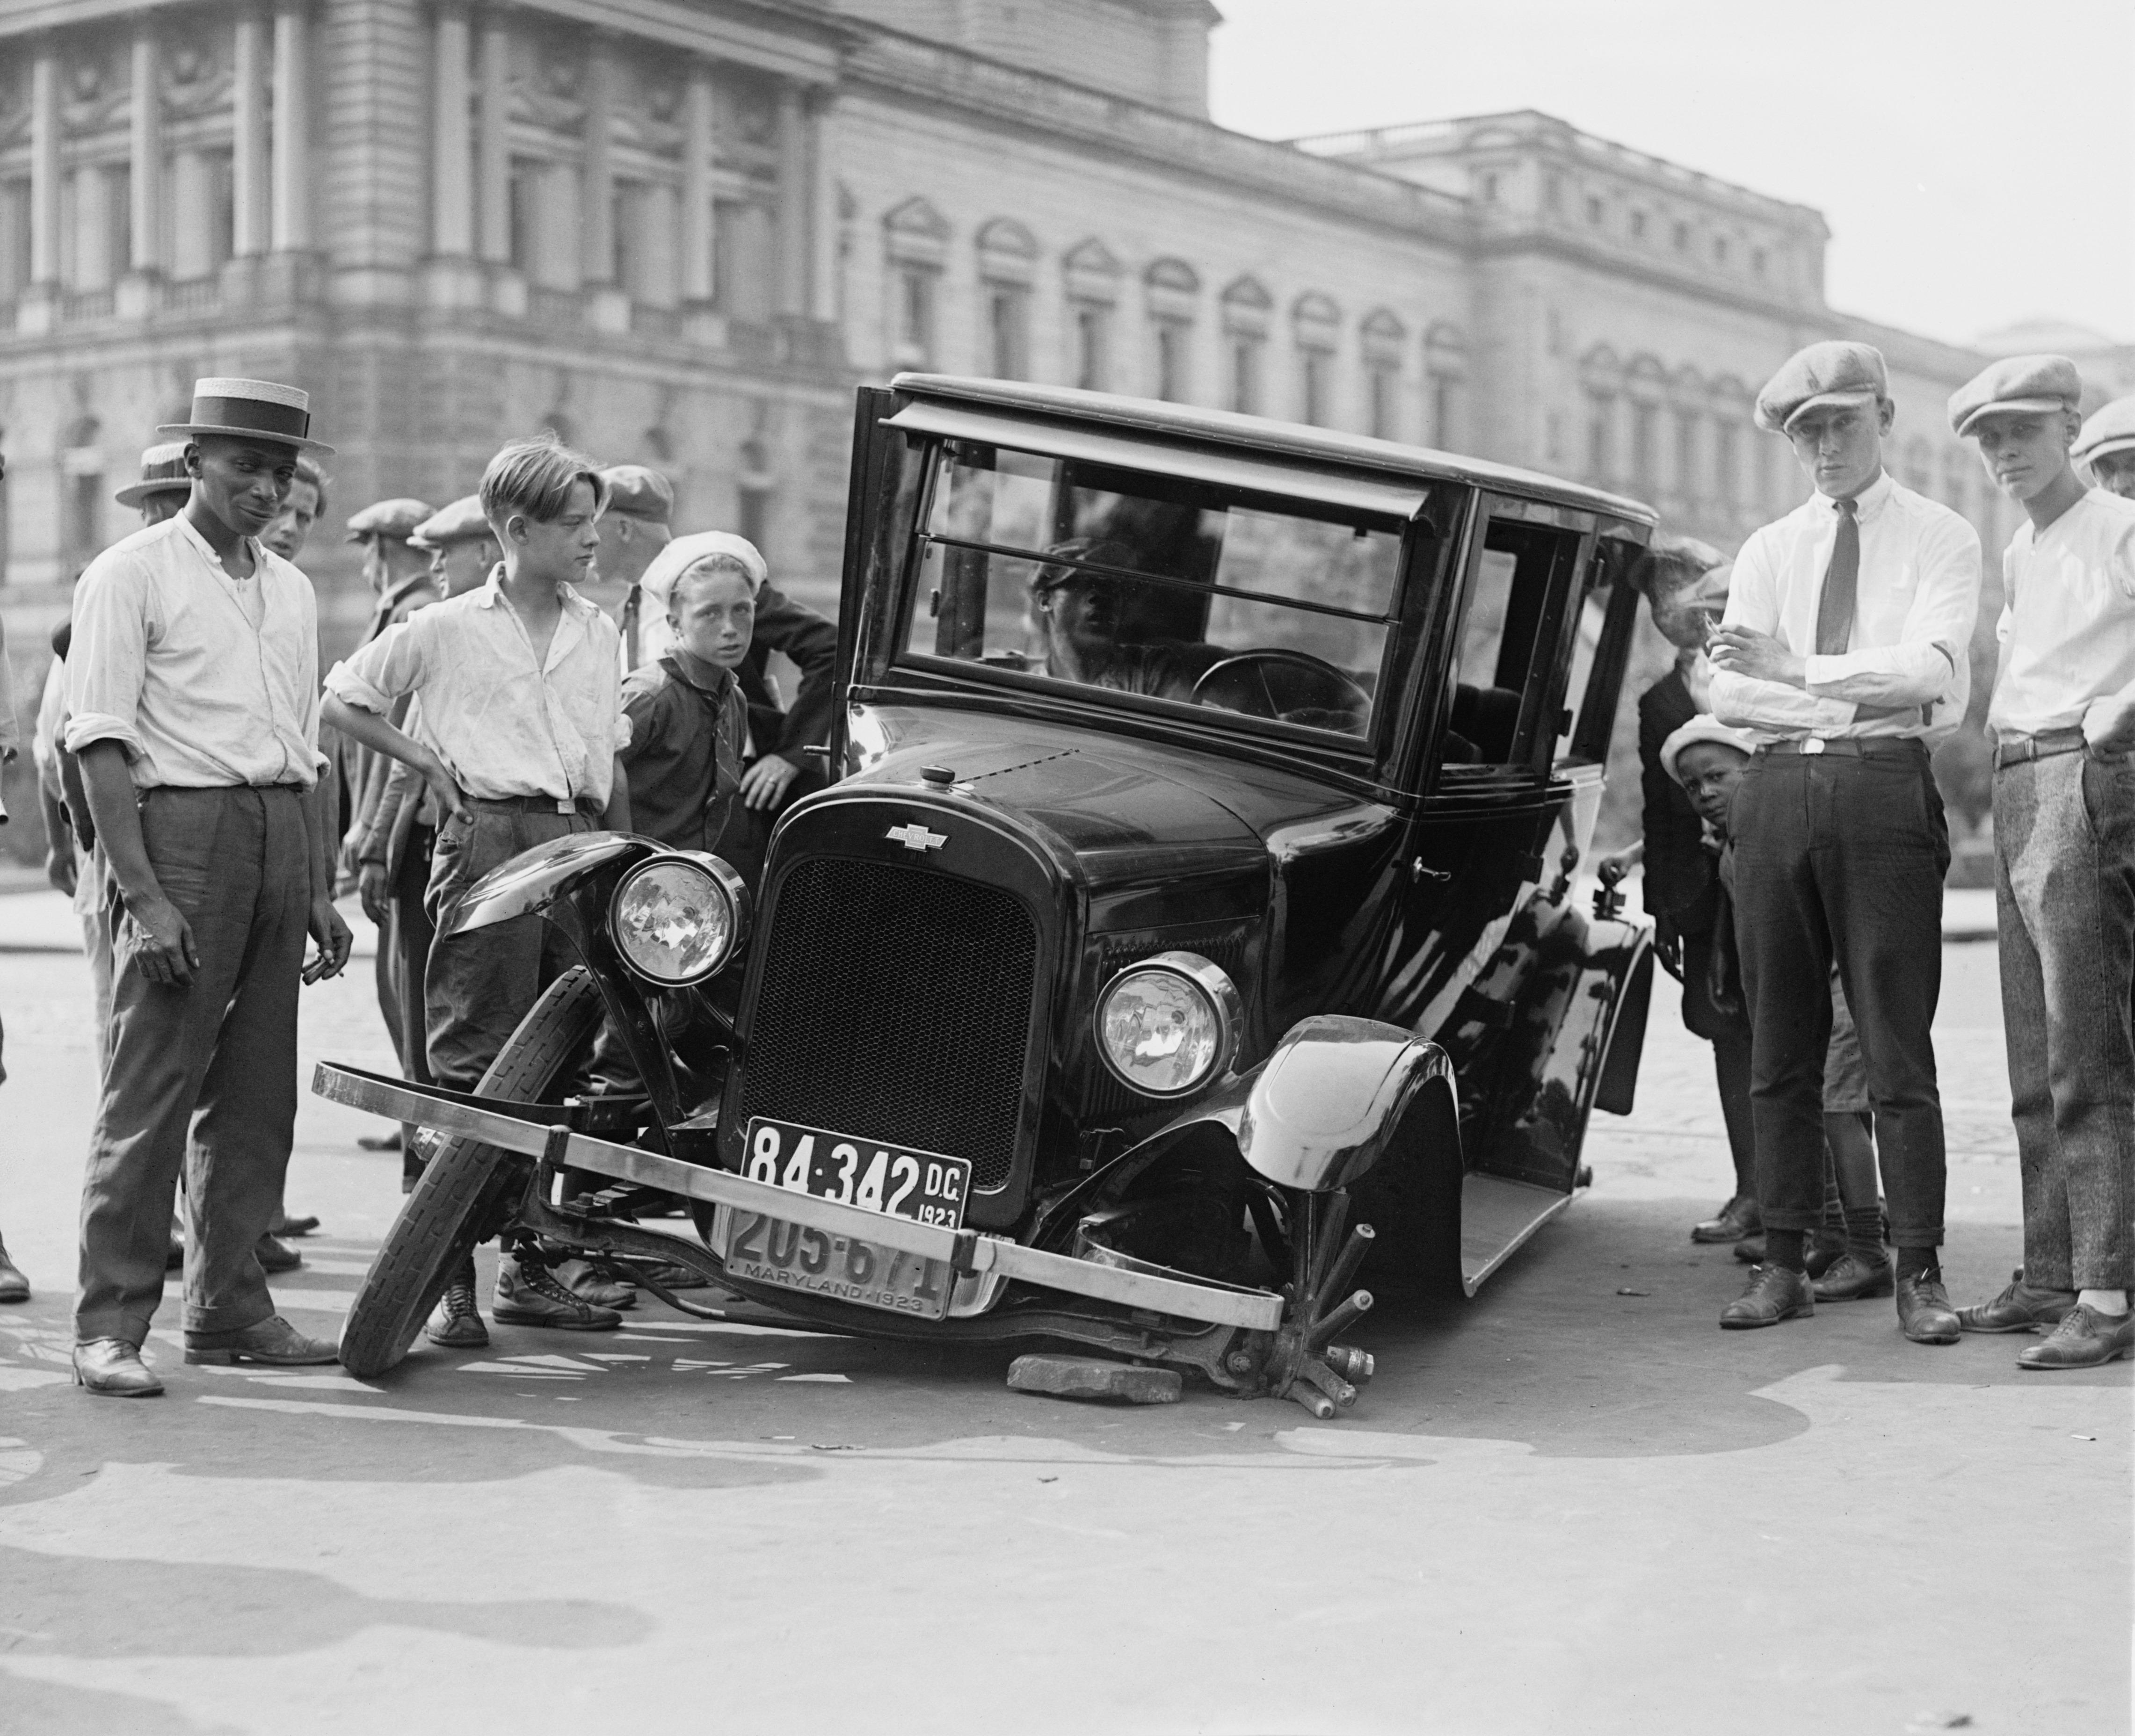 Black And White People Car Vehicle Broken Usa Auto Monochrome Automotive Vintage Oldtimer Classic Defect